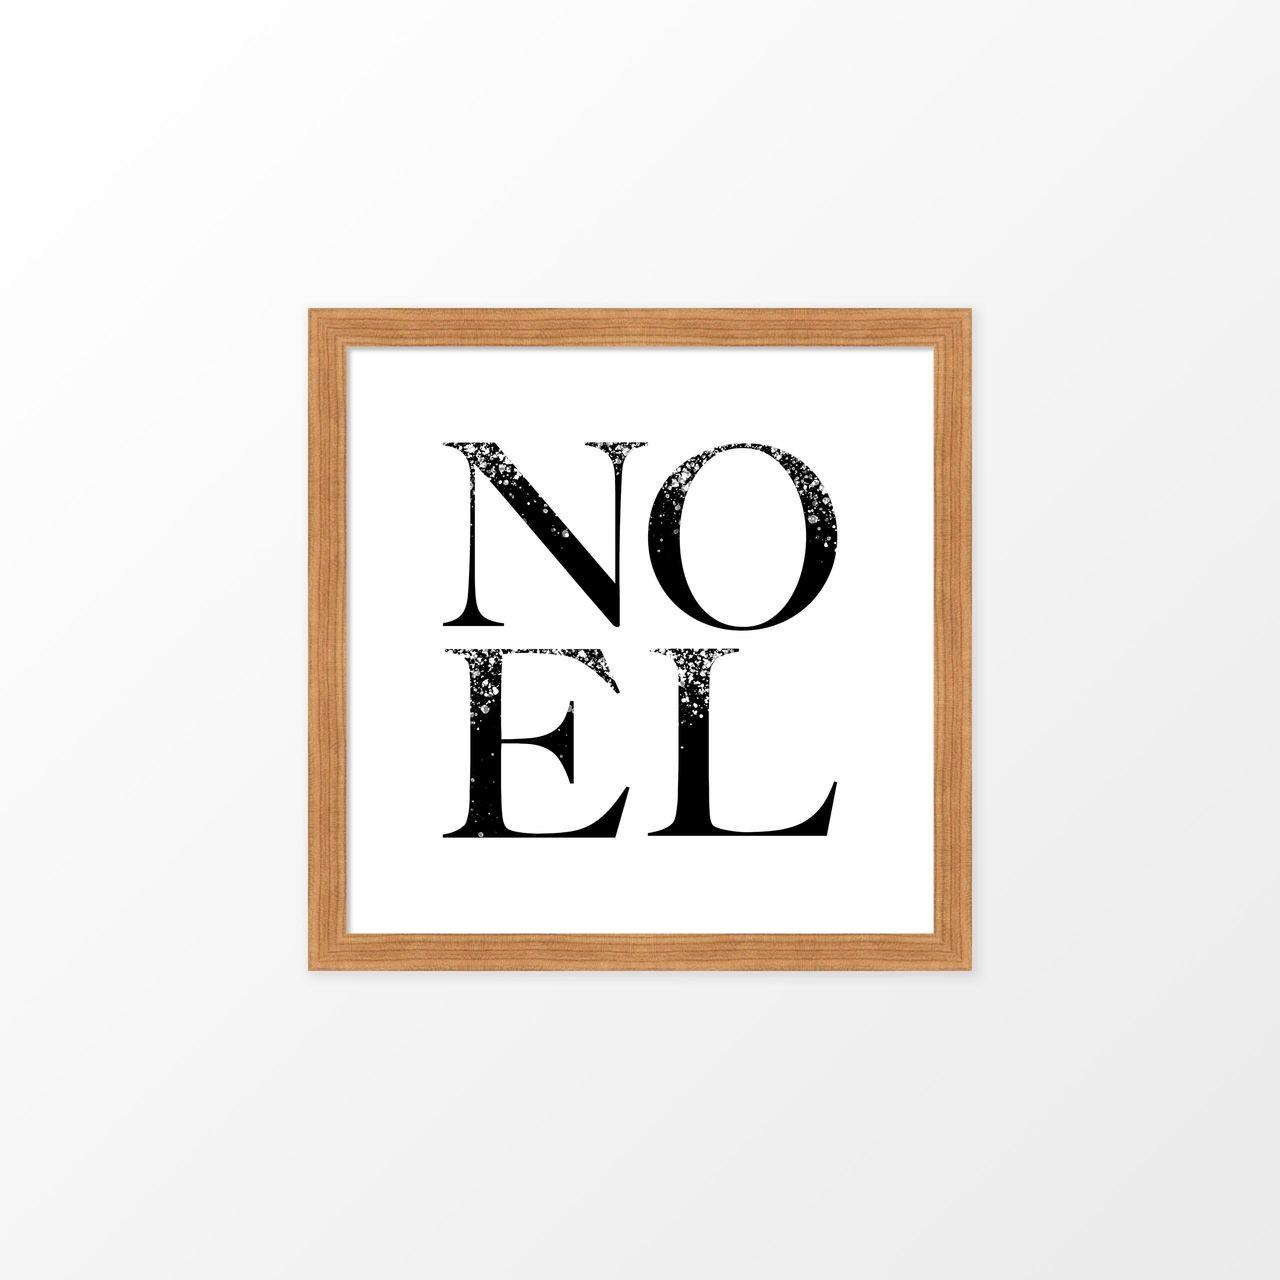 'Noel' Christmas Digital Art Print from The Printed Home (Printable)